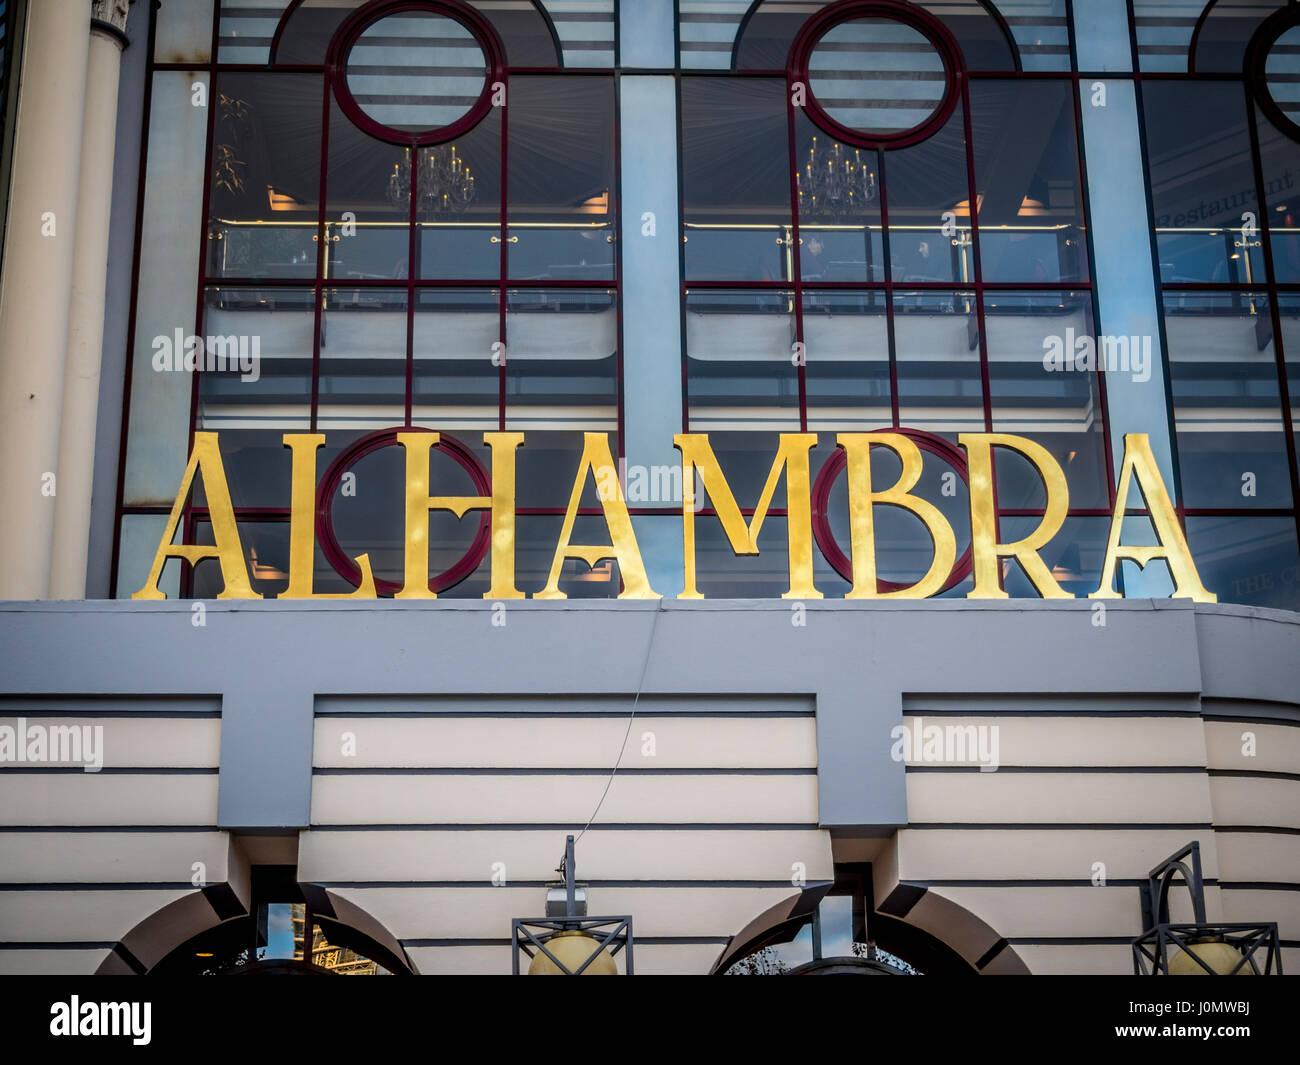 The Alhambra theatre, Bradford, West Yorkshire, UK. - Stock Image